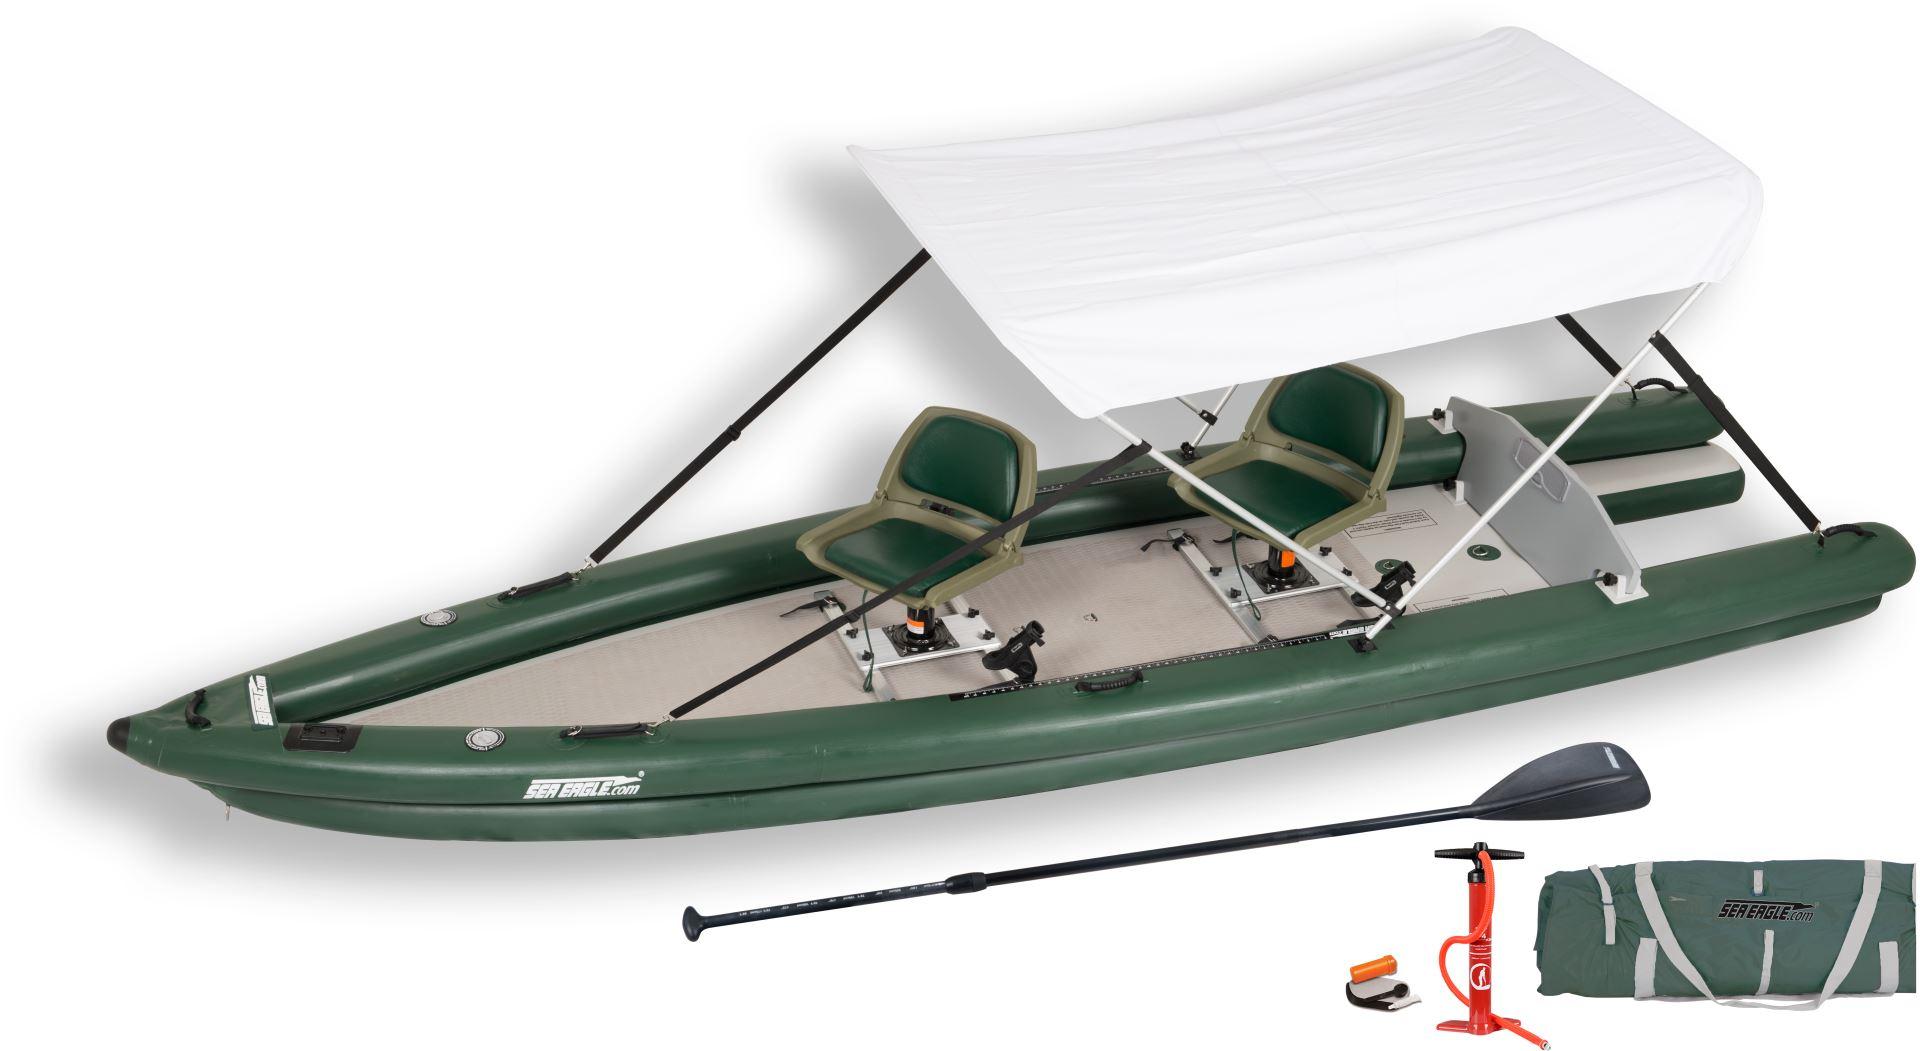 Sea Eagle Inflatable Fishskiff 16 Fishing Boat